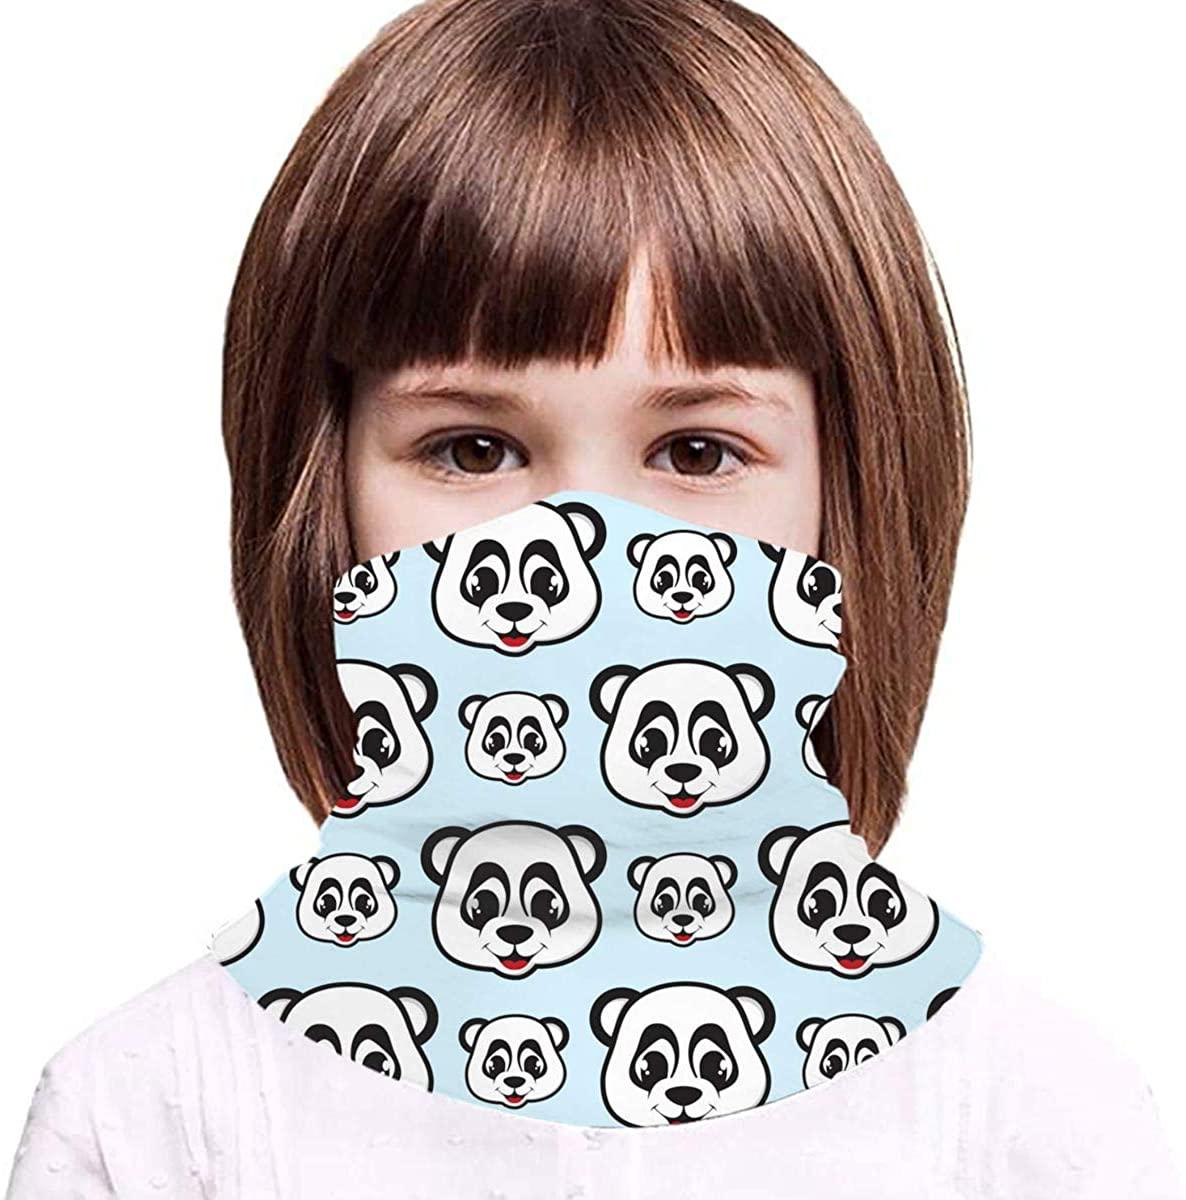 Smile Panda Neck Gaiter Face Mask Bandana Dust Wind Sun UV Balaclava for Teen Boy Girl Outdoors